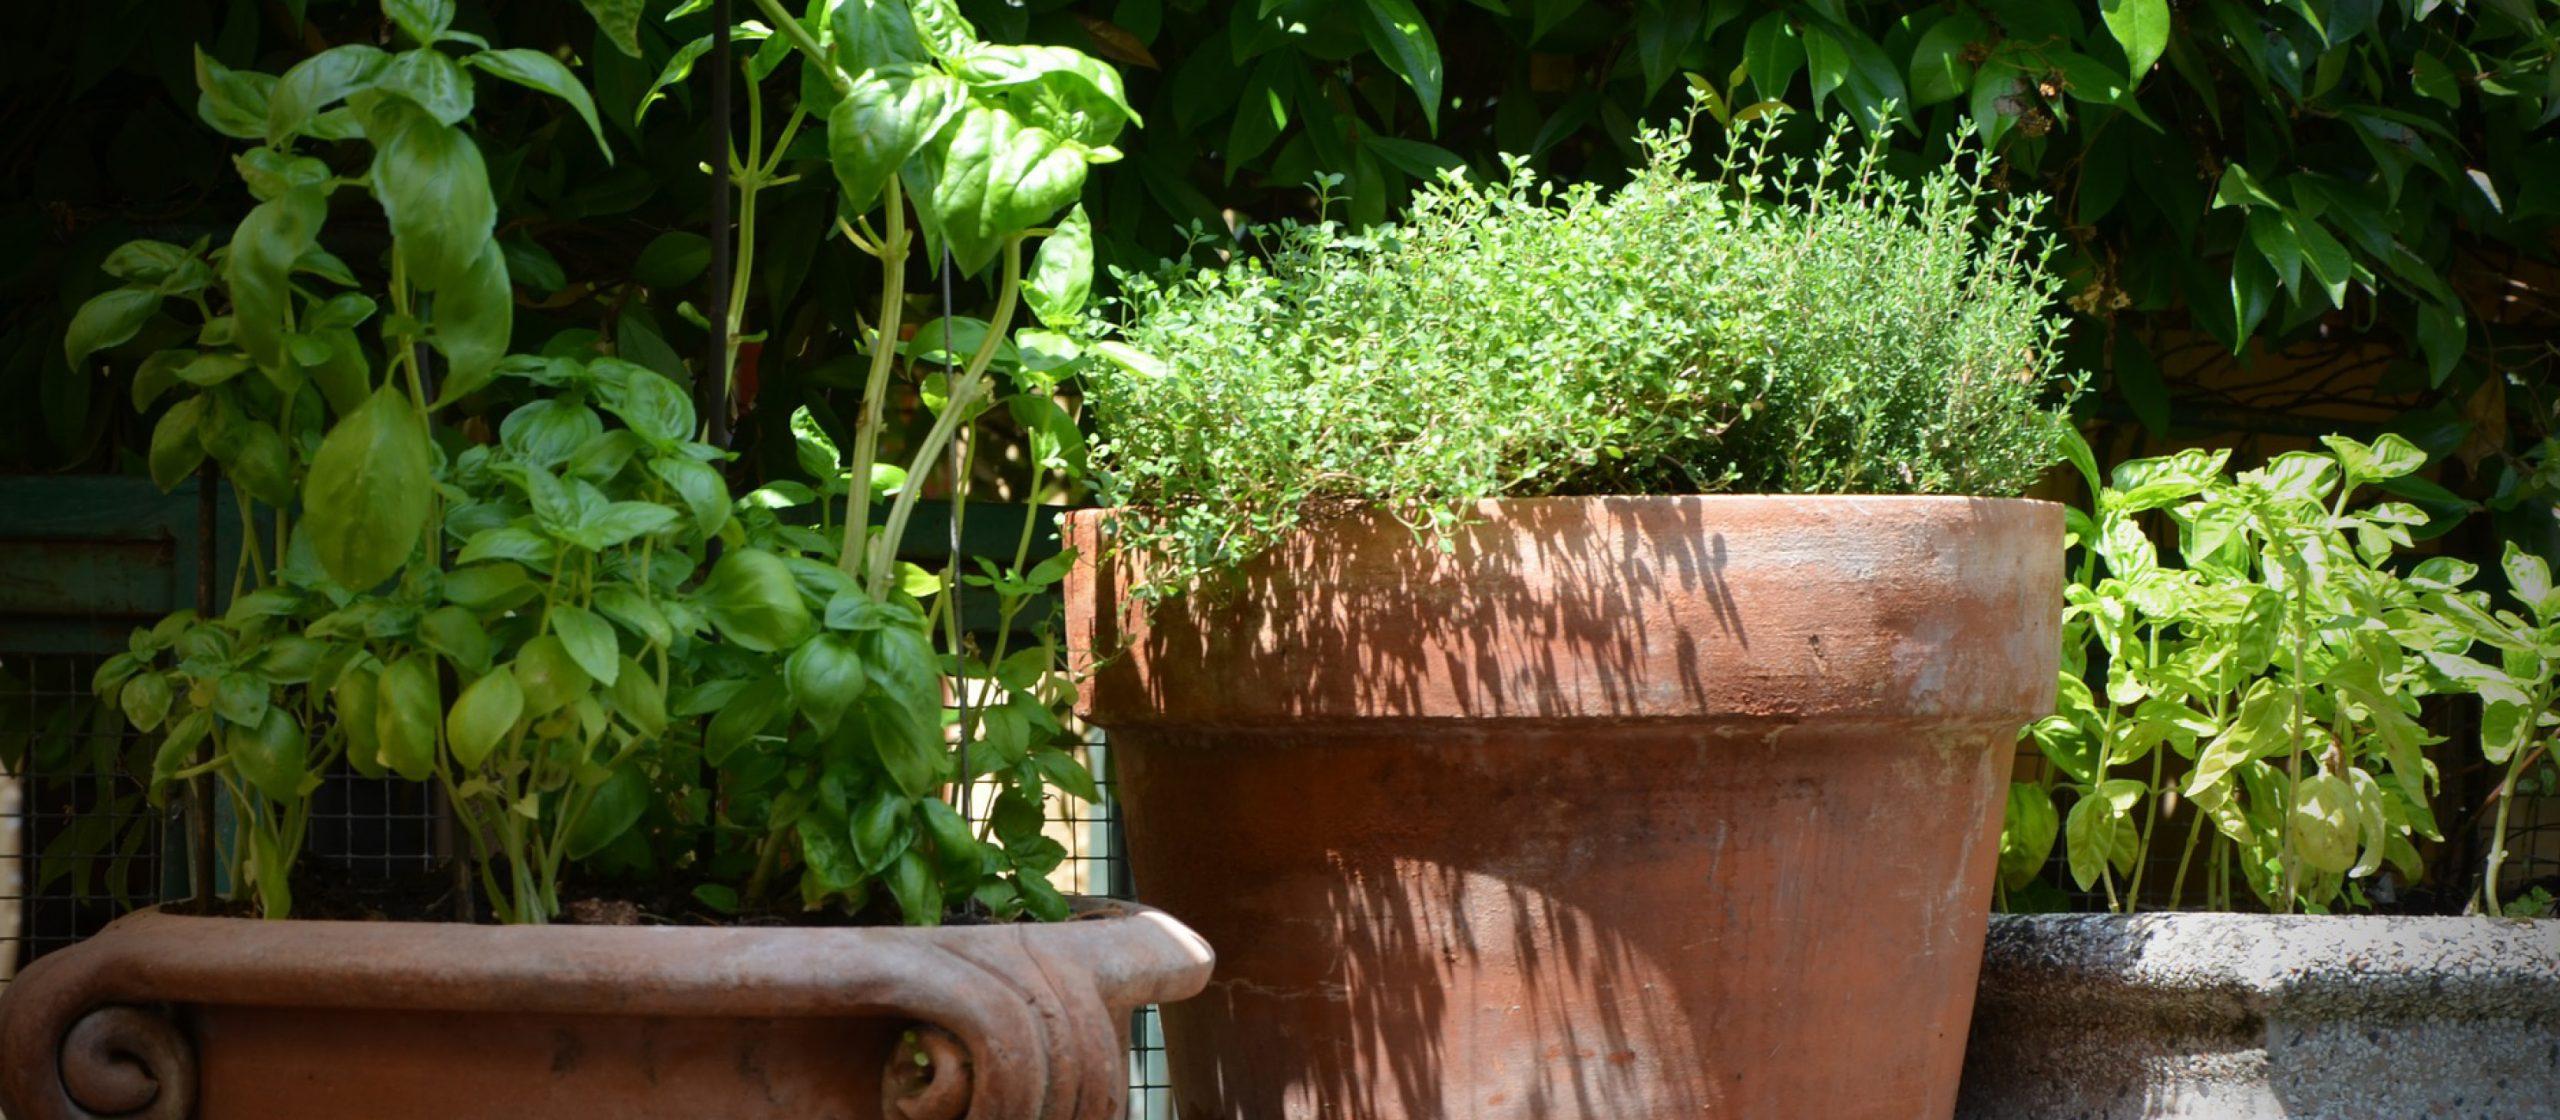 How to Grow Herbs Ohio